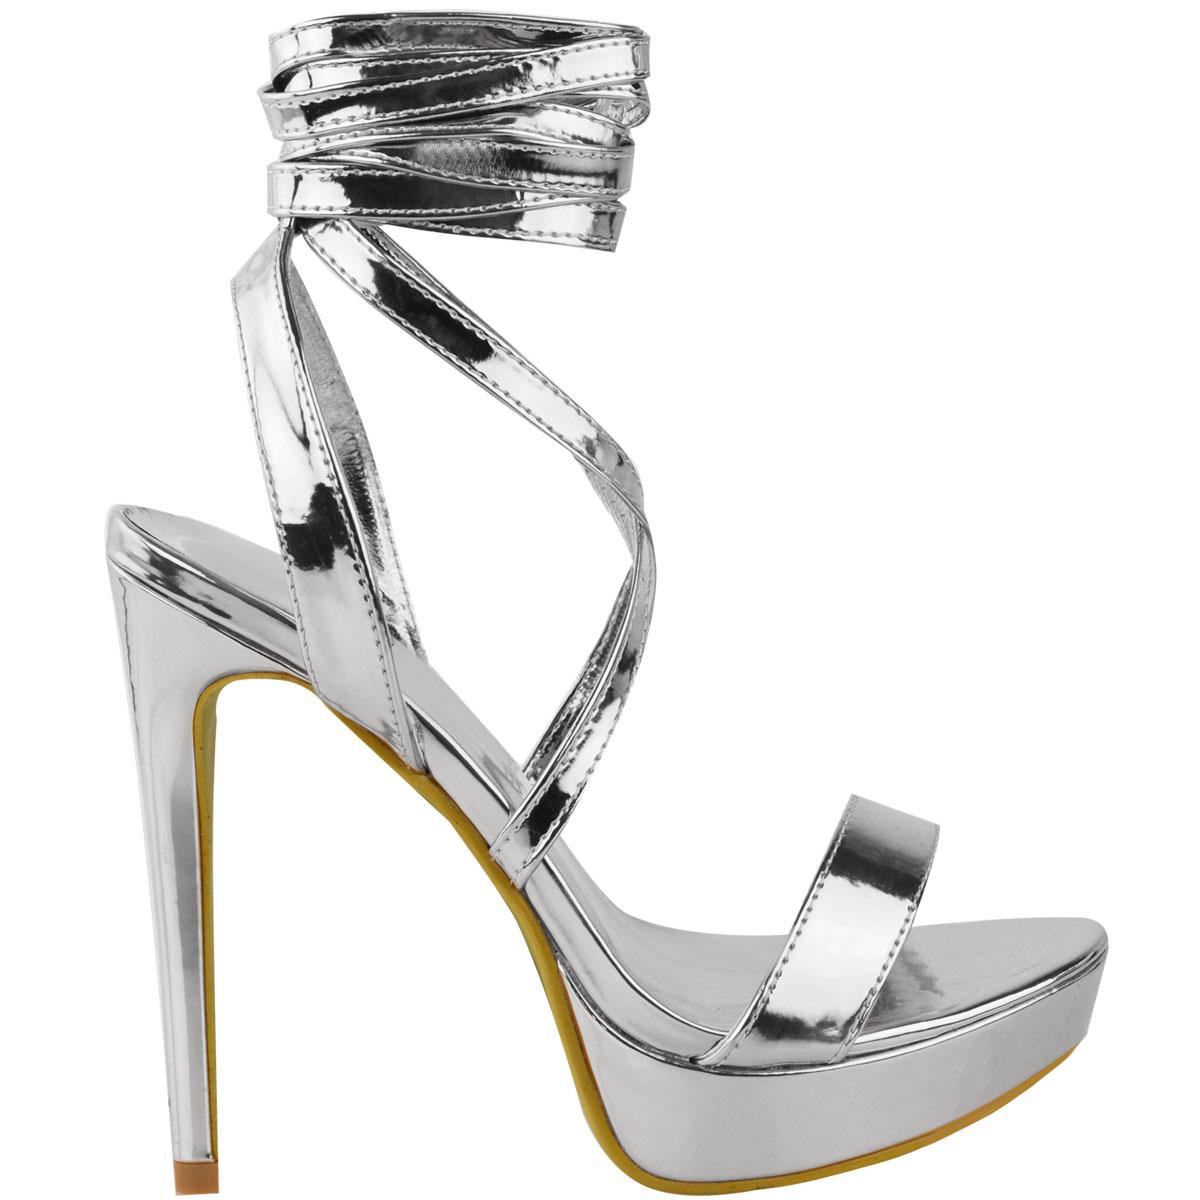 Womens-Ladies-Stilettos-High-Heels-Strappy-Platforms-Sandals-Diamante-Shoes-Size thumbnail 47